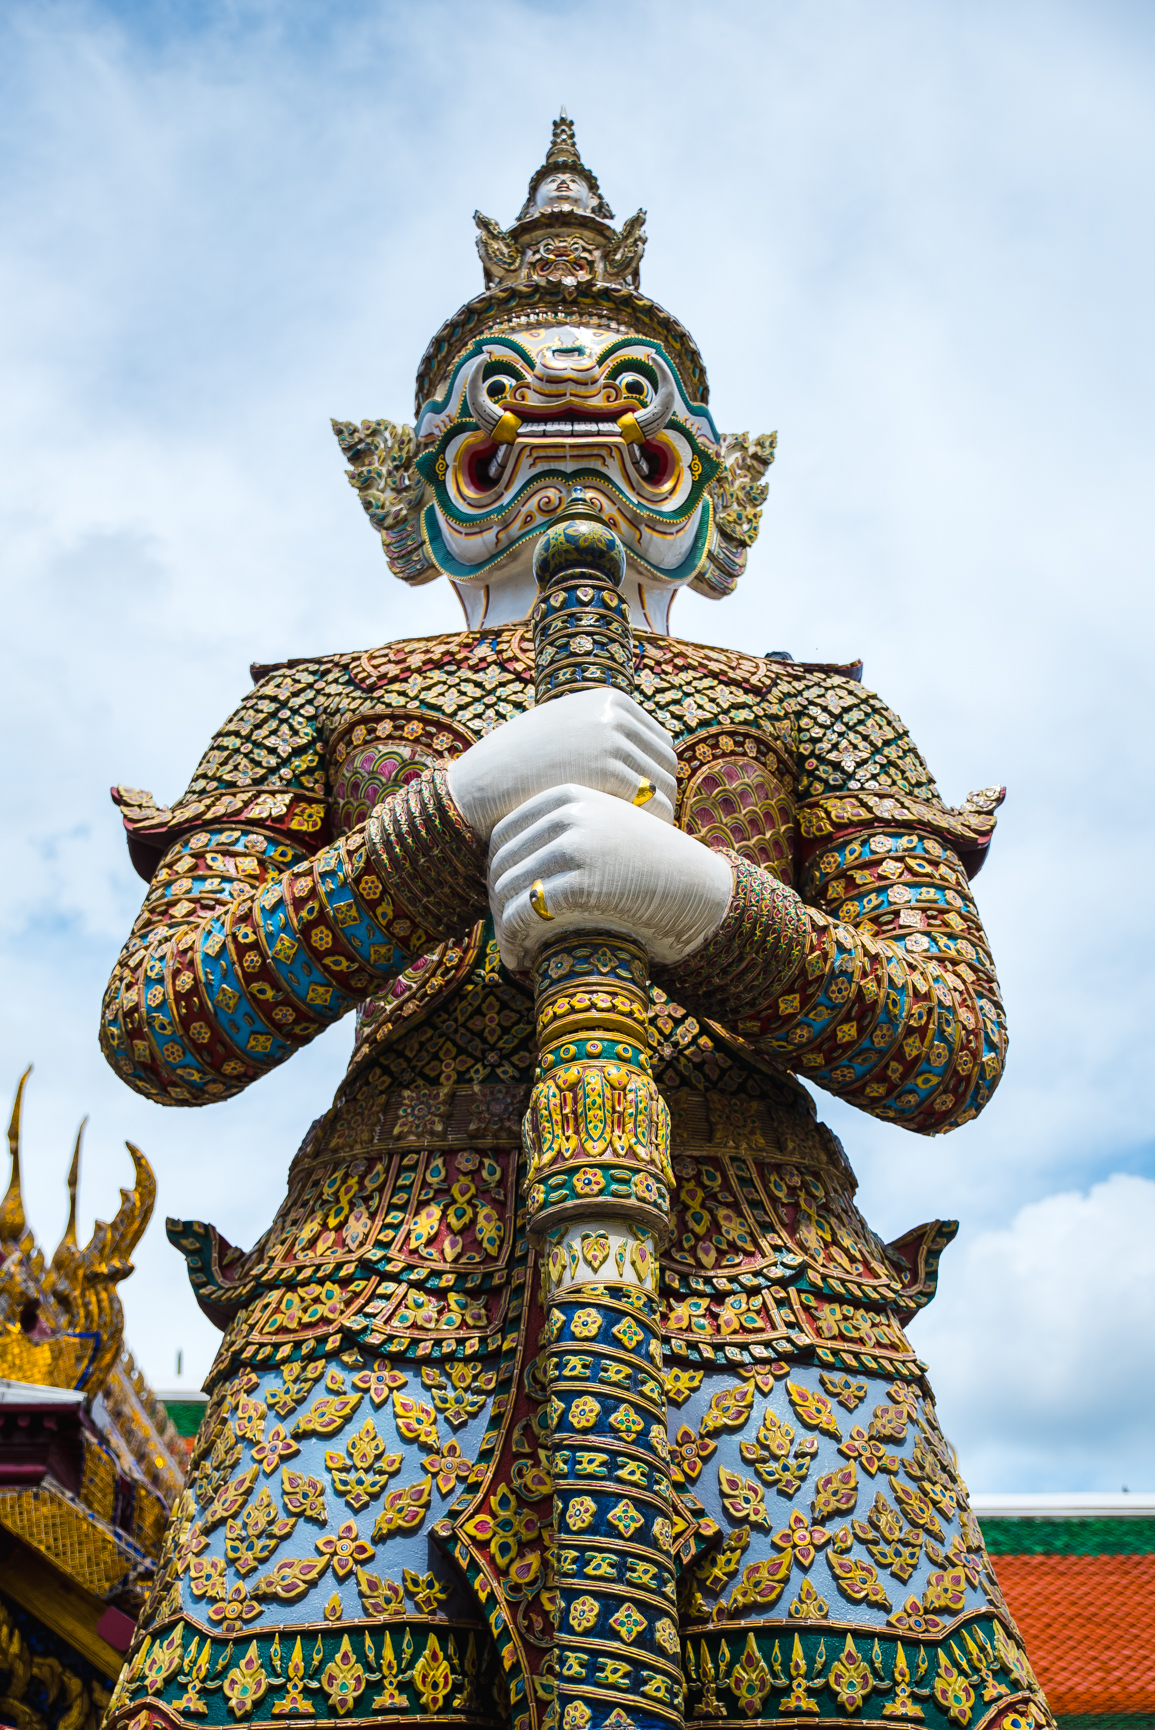 Ibrahim Badru Thailand eyeobee ART The Wandering eye_-36.jpg